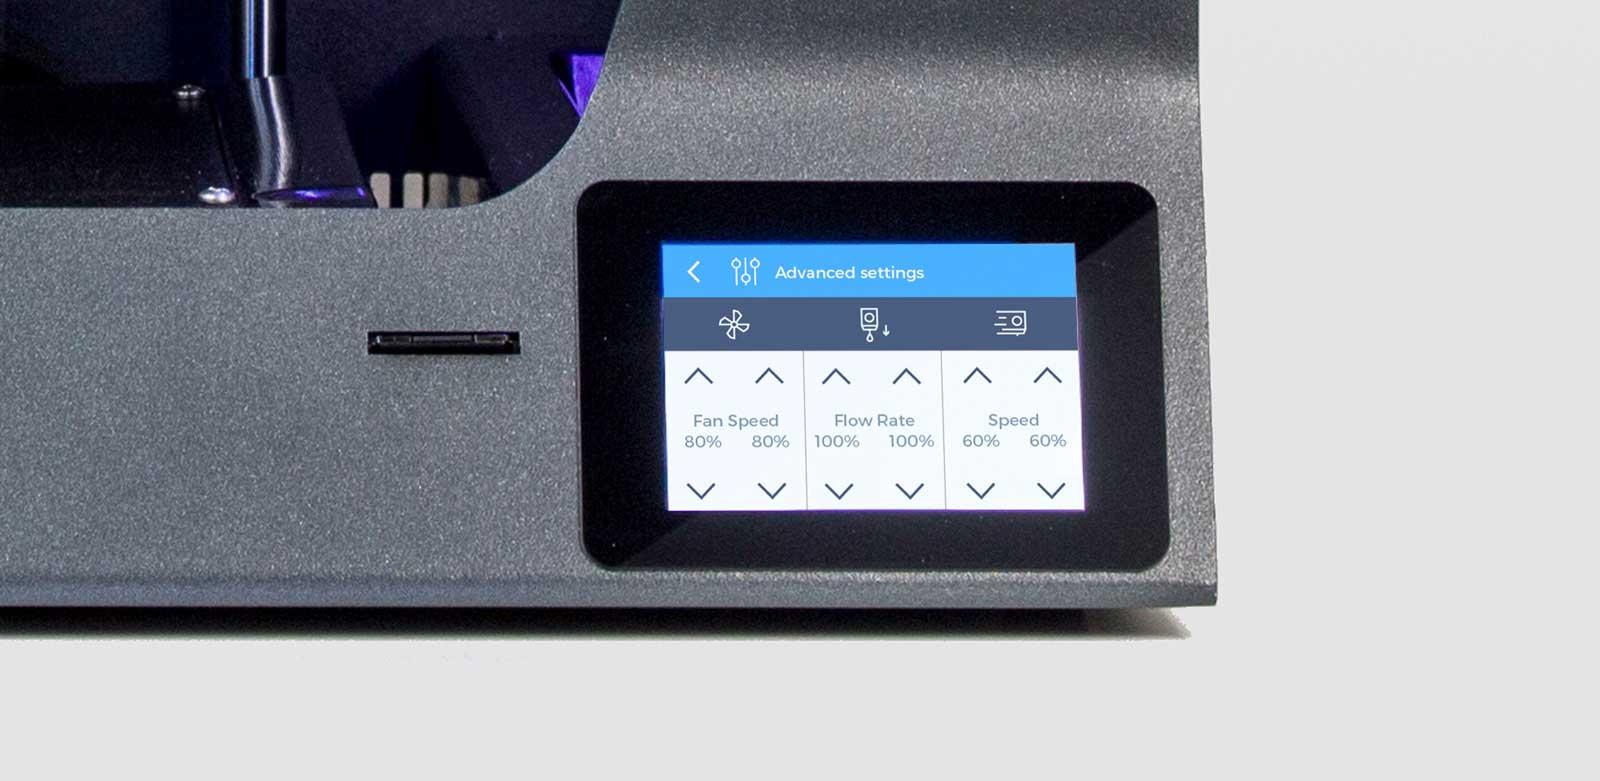 BCN3D_Technologies_new_UX_GUI_touchscreen_Sigma_Sigmax_R19_advanced_settings